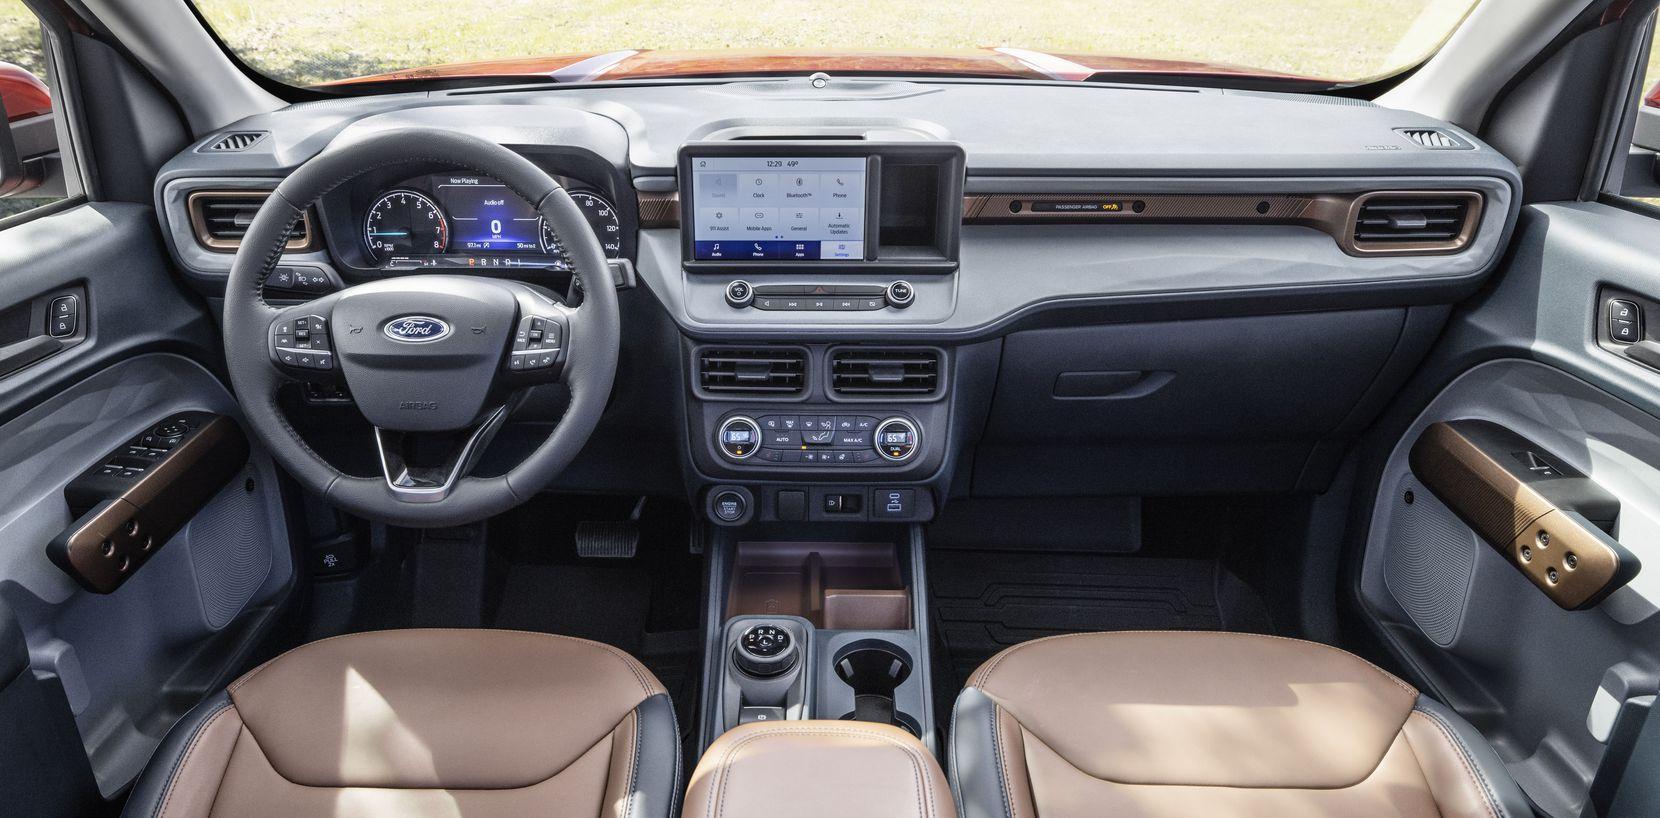 The 2022 Ford Maverick 2L-EcoBoost AWD Lariat interior.